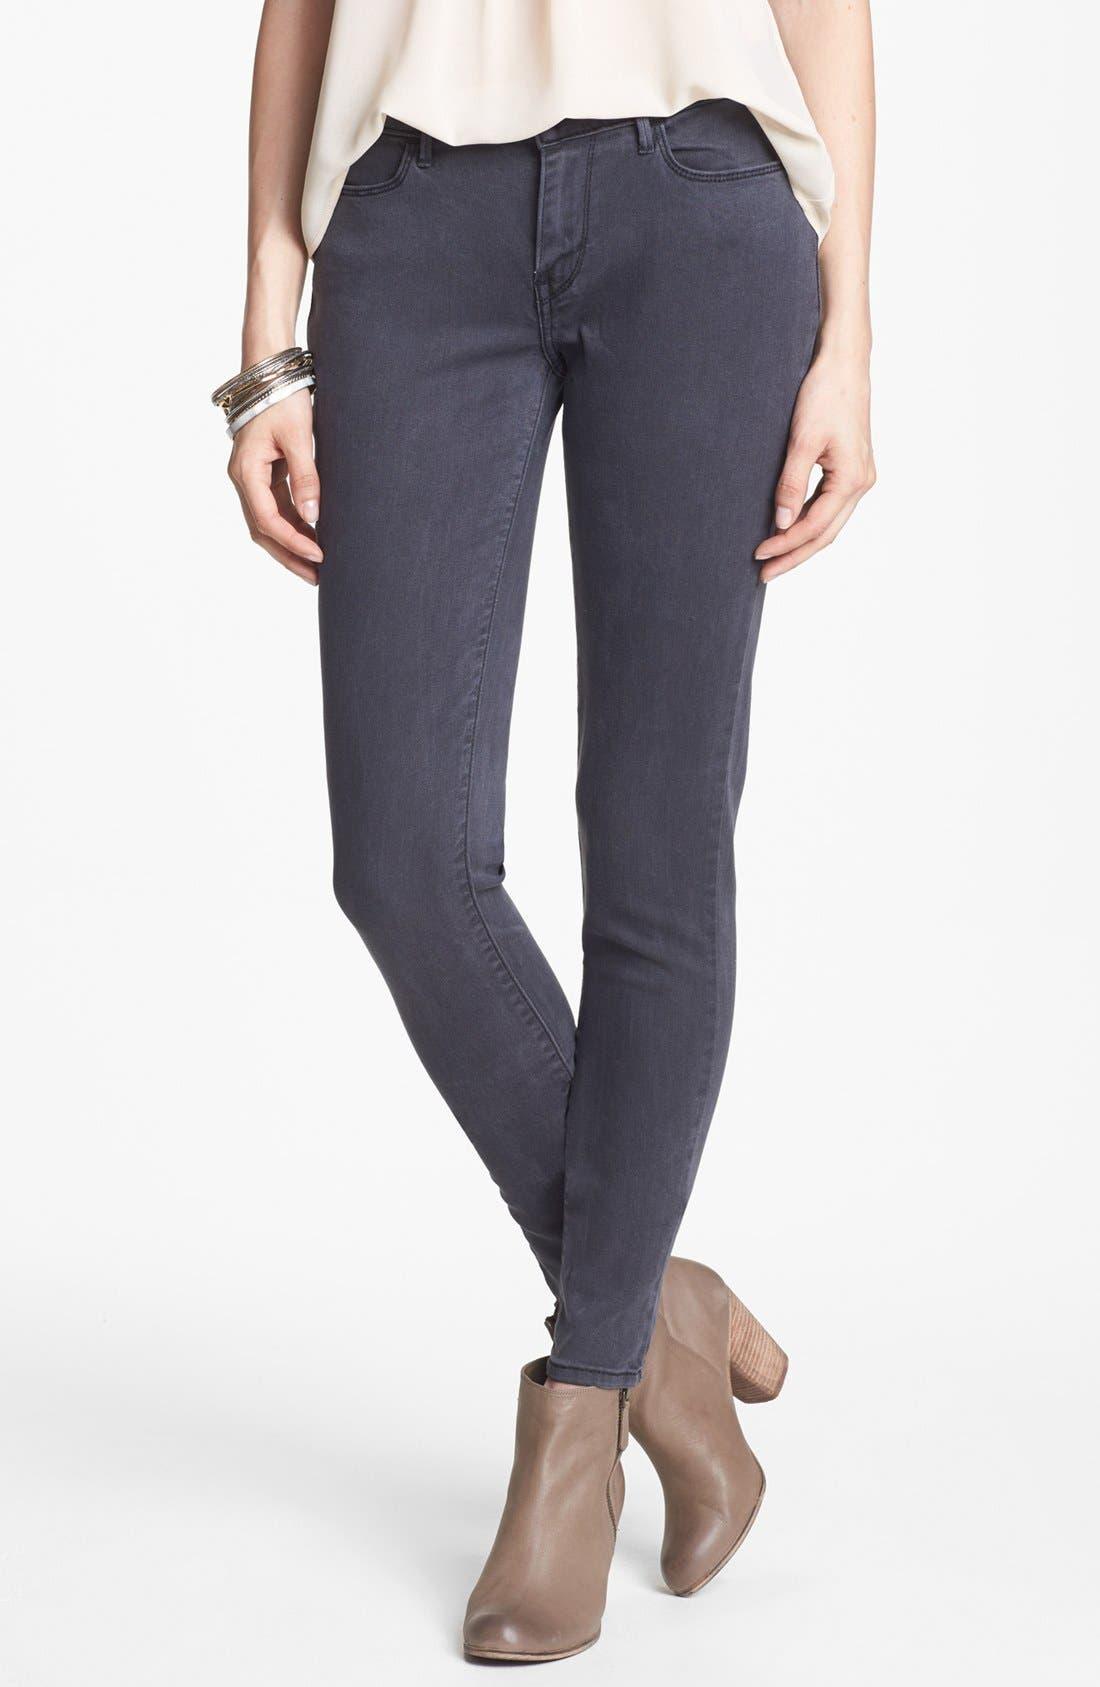 Main Image - Levi's® 'Core Better Legging' Skinny Jeans (Dark)